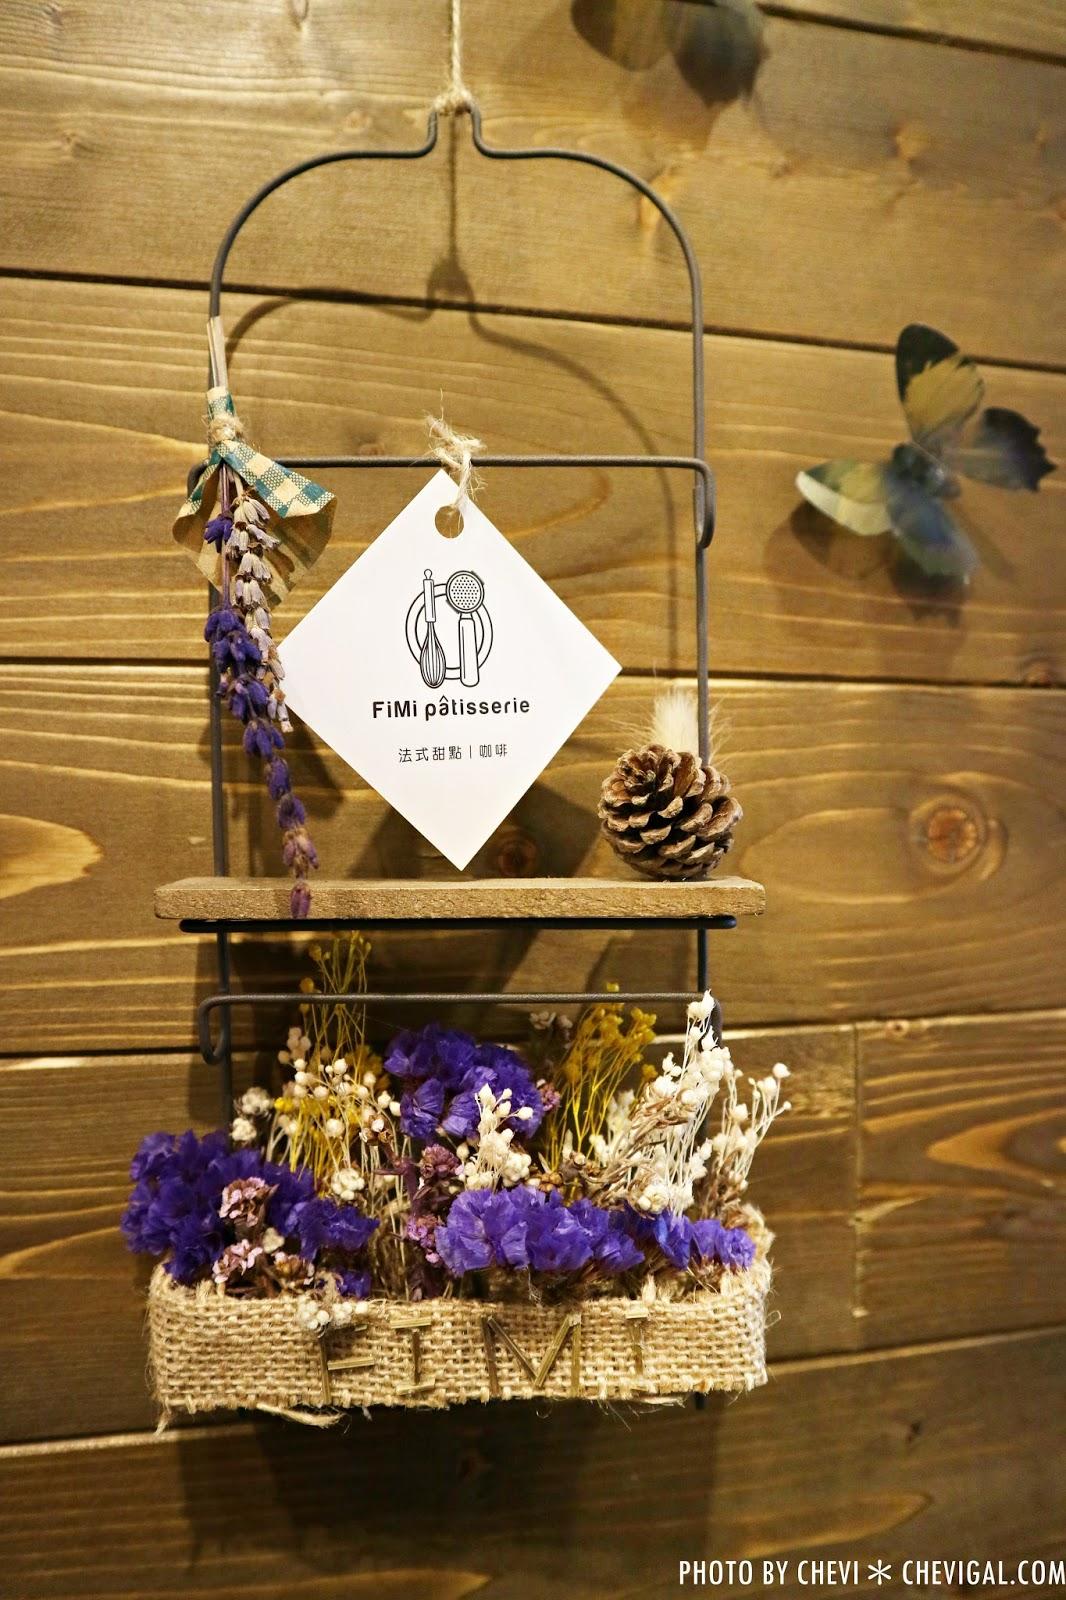 IMG 9545 - 台中烏日│FiMi 小後山廚房。新鮮手作法式甜點。森林清新風格好放鬆